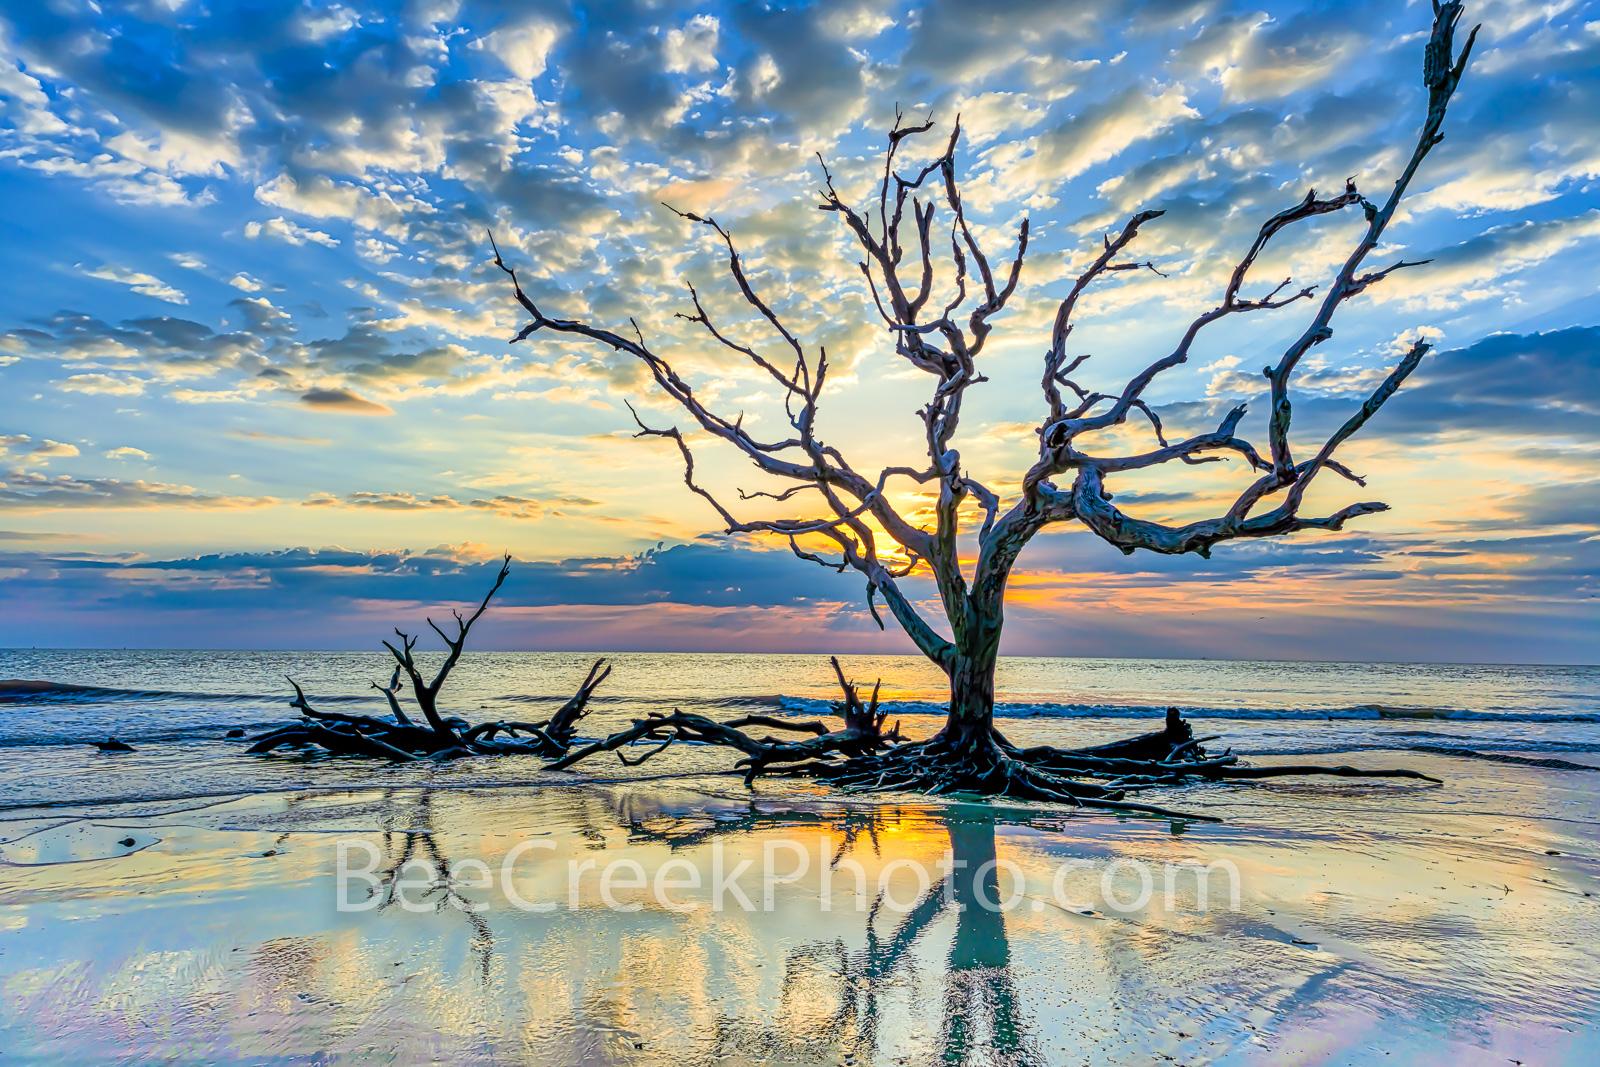 driftwood beach, morning, sunrise, reflections, sunrise, jekyll island, golden isles, barrier island, alantic coast, Georgia, east coast, landscape, beach,, photo